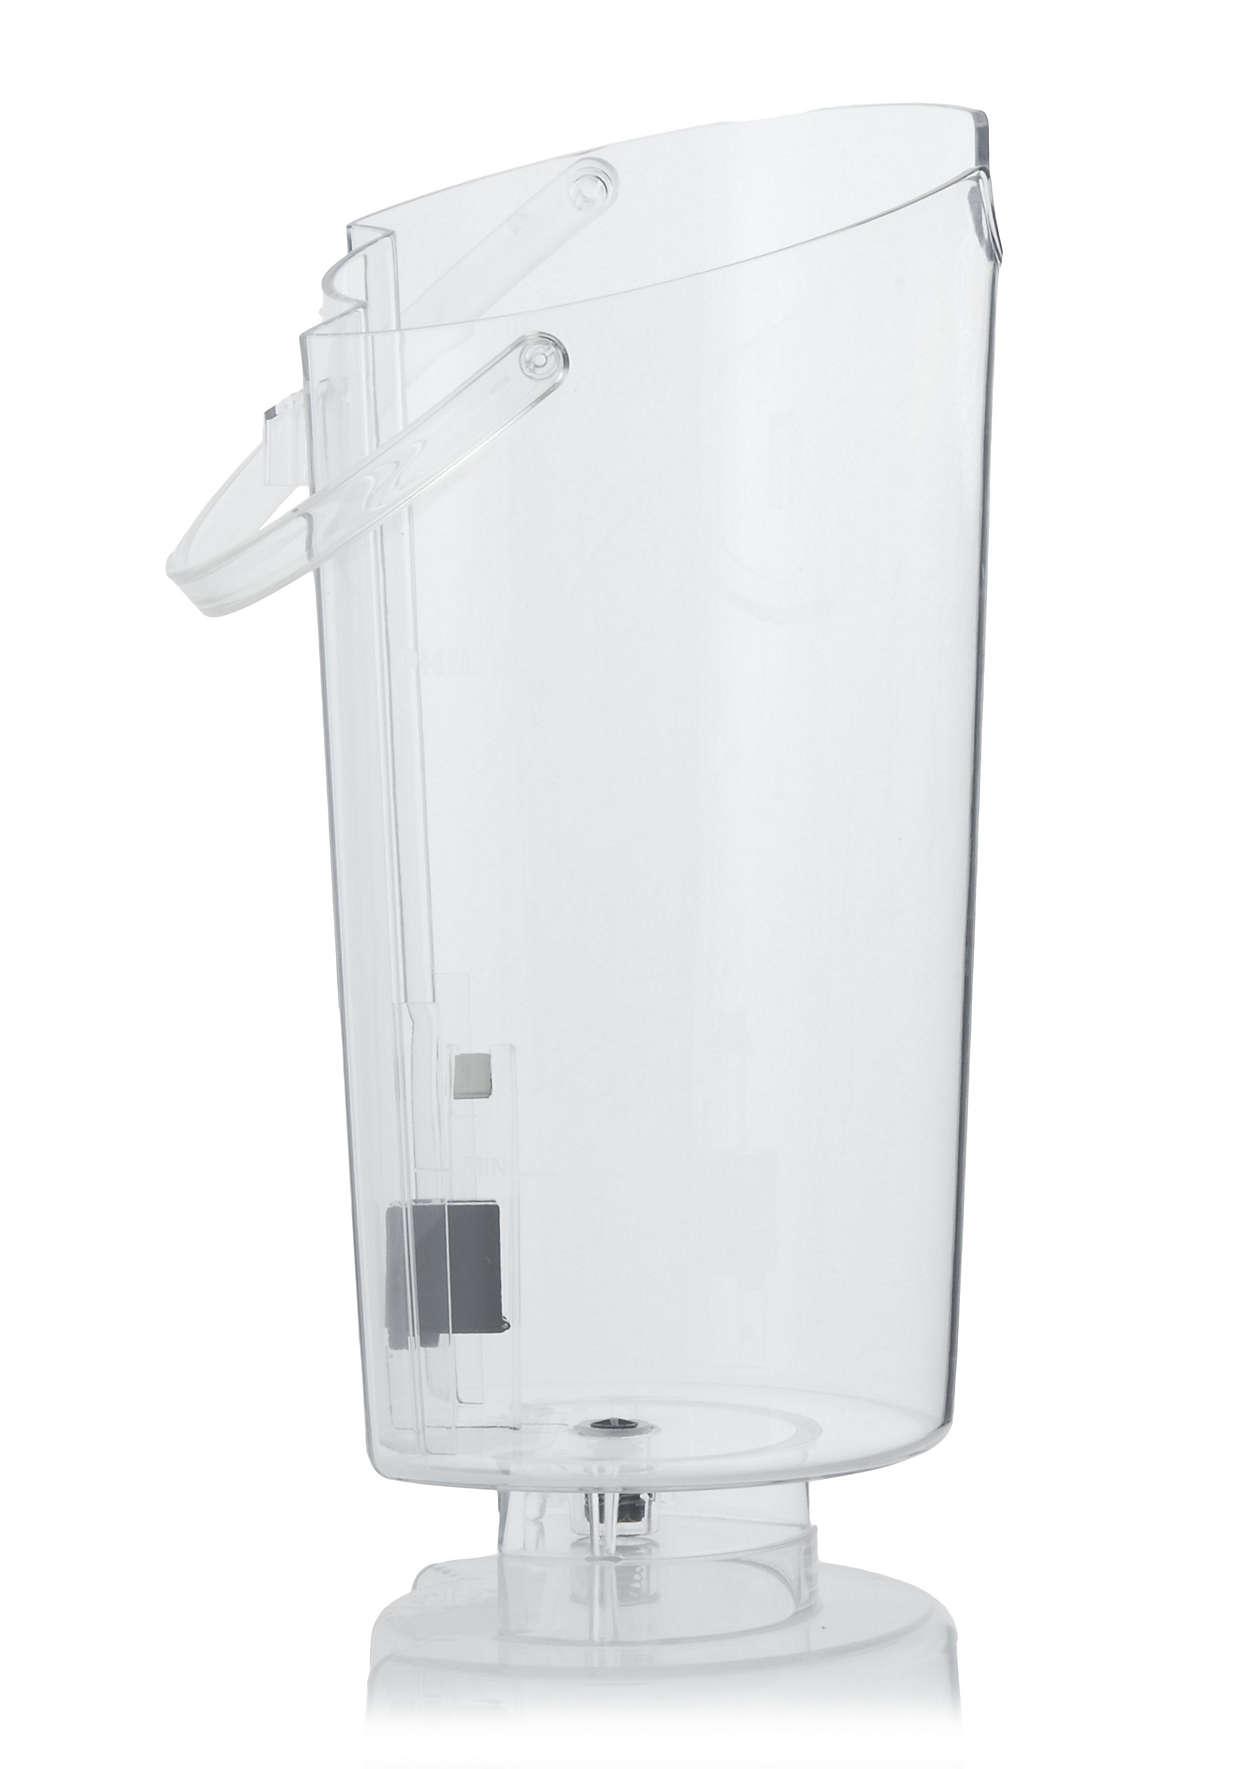 XL-vesisäiliö